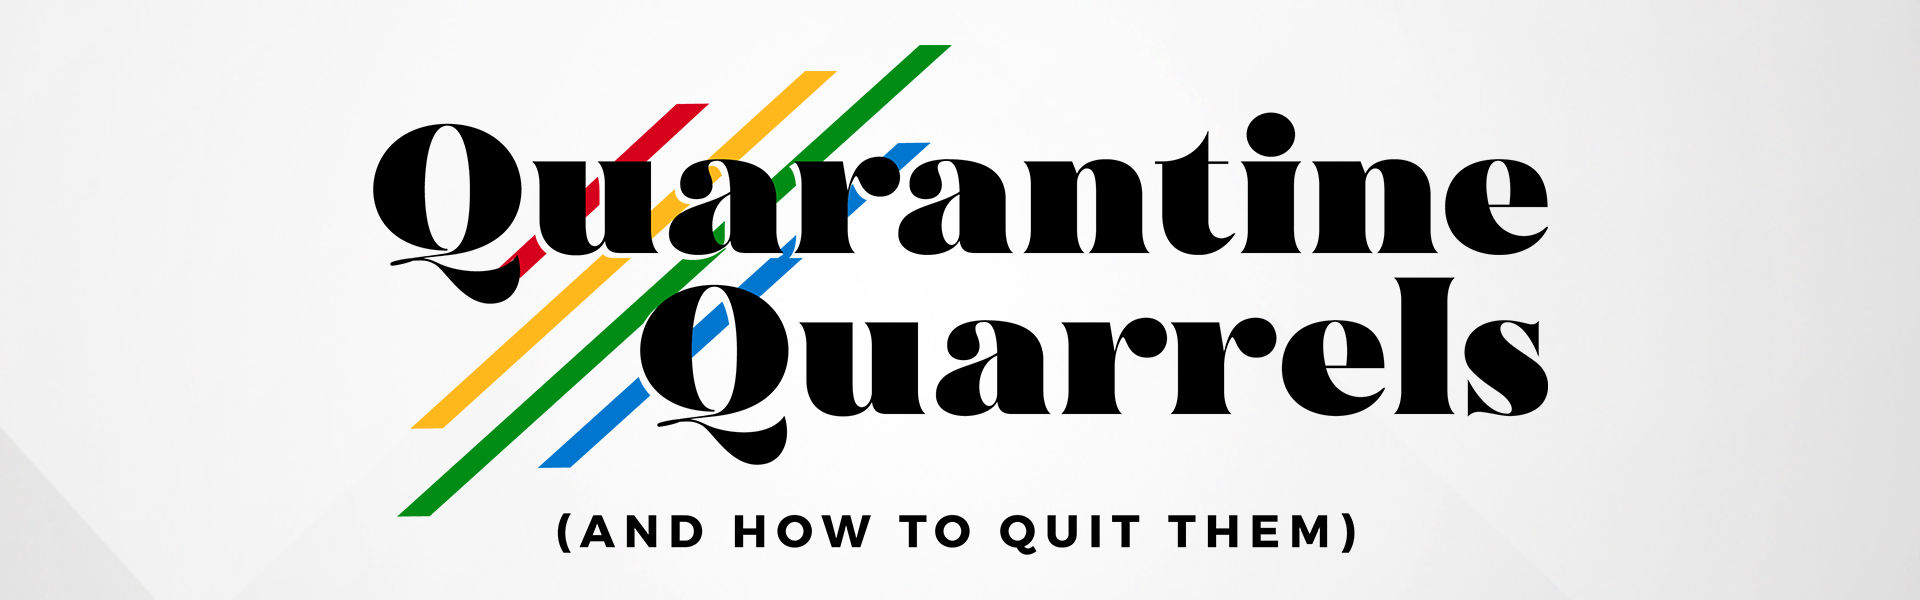 Quarantine Quarrels